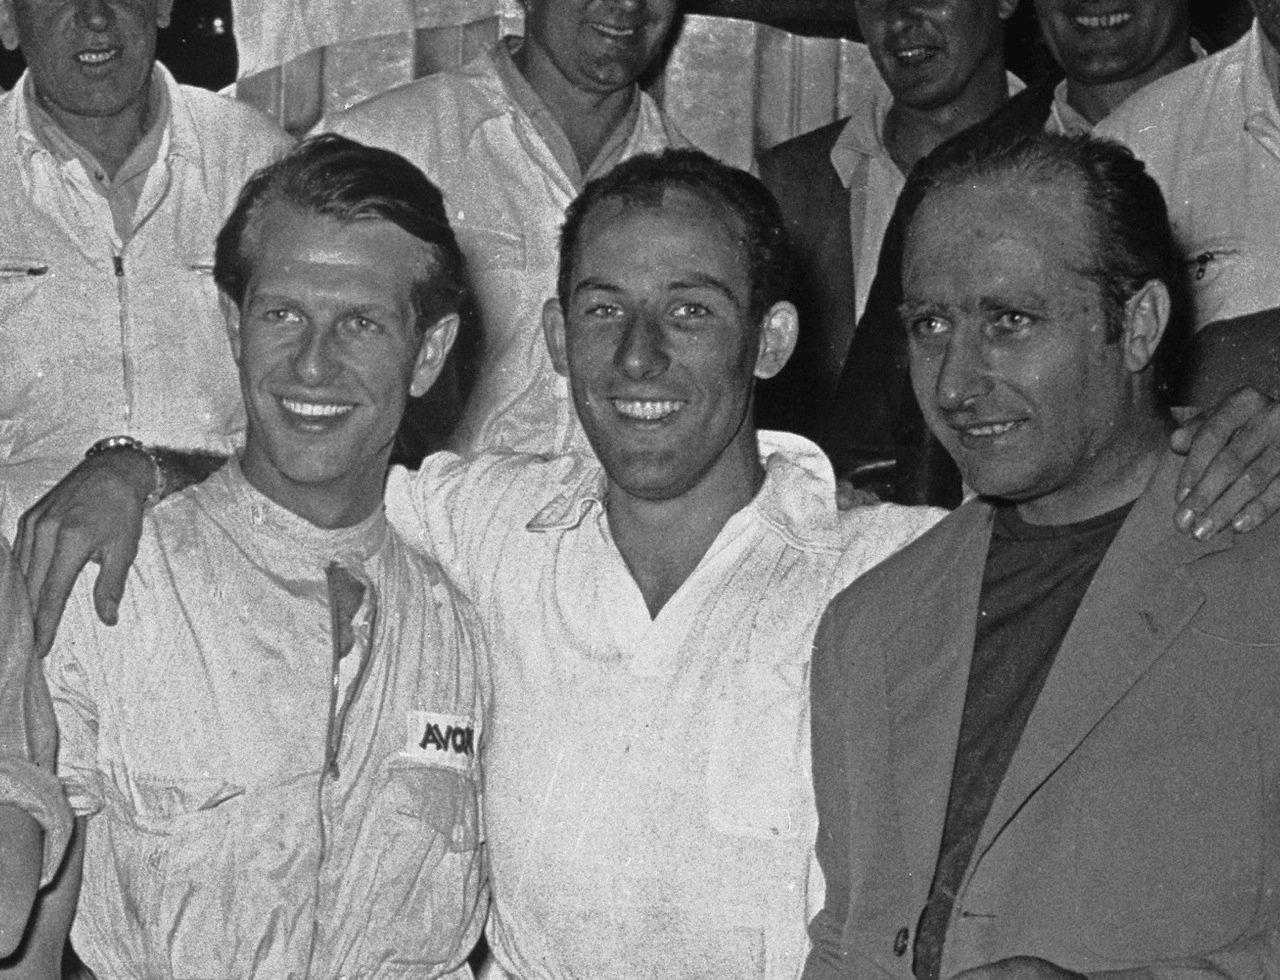 Крапленые карты. 1956 г. Формула-1: чемпионаты которых не было!